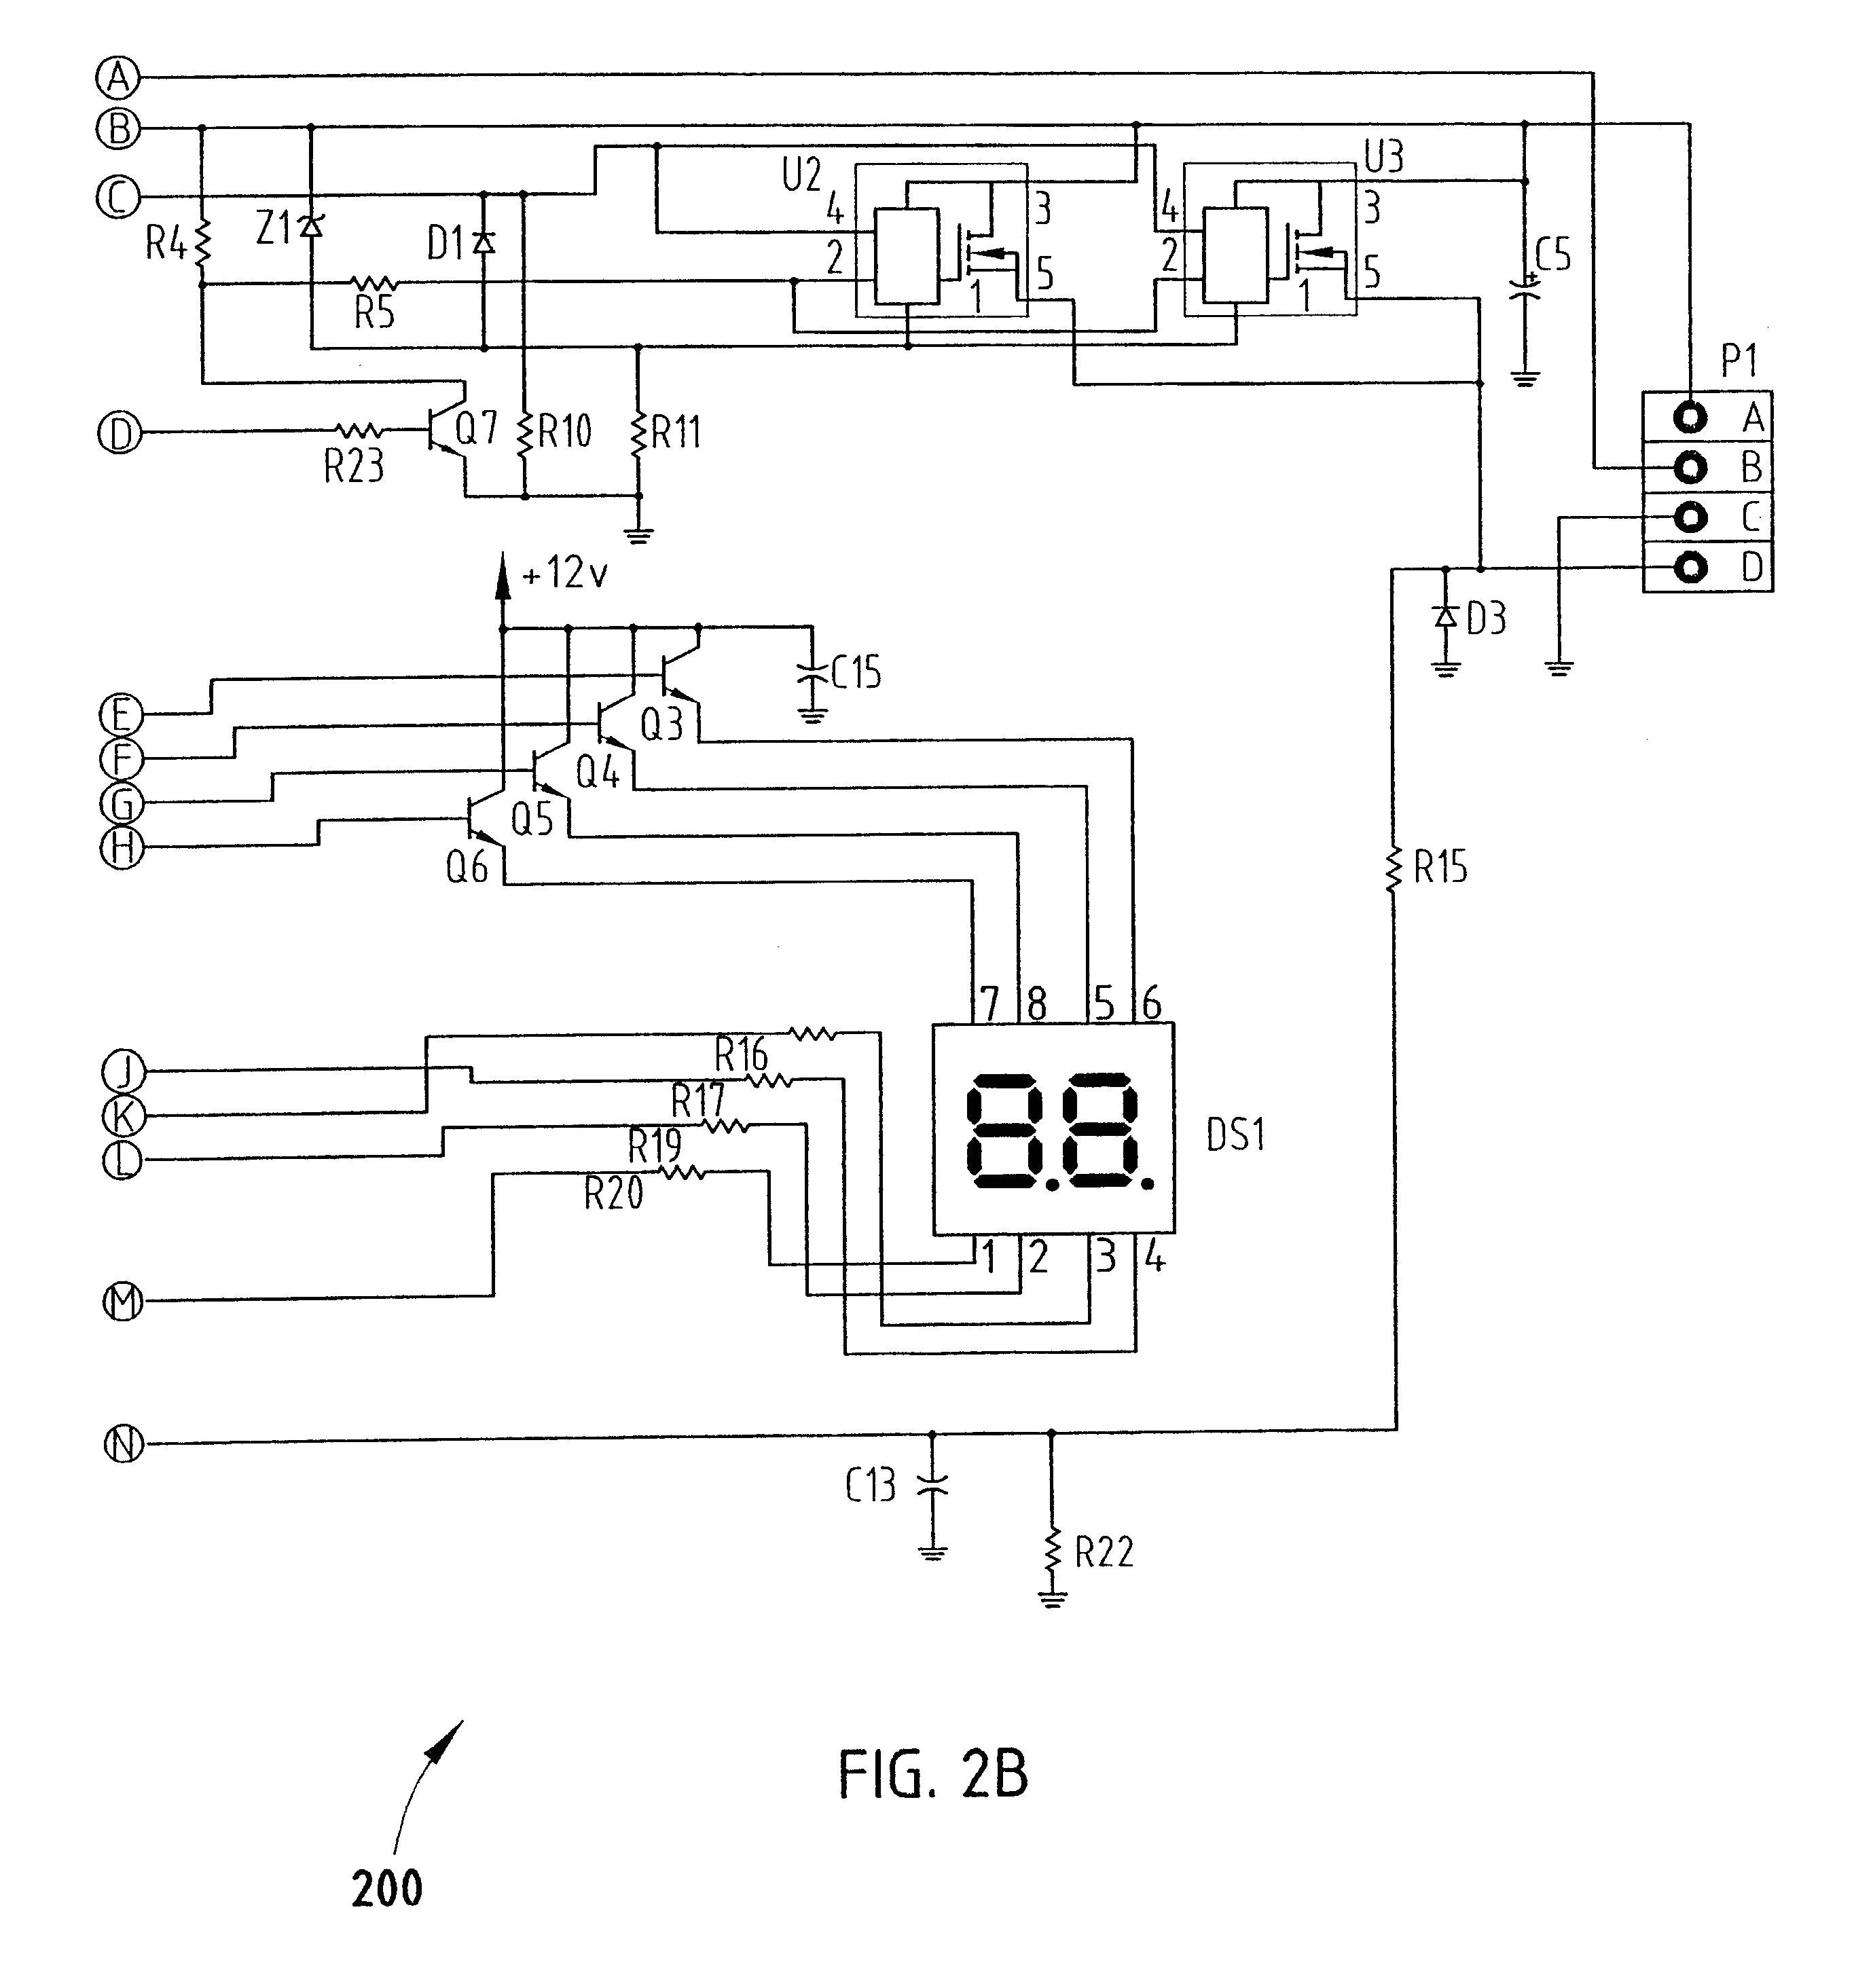 ke control wiring diagram auto diagram database draw e ke controller wiring